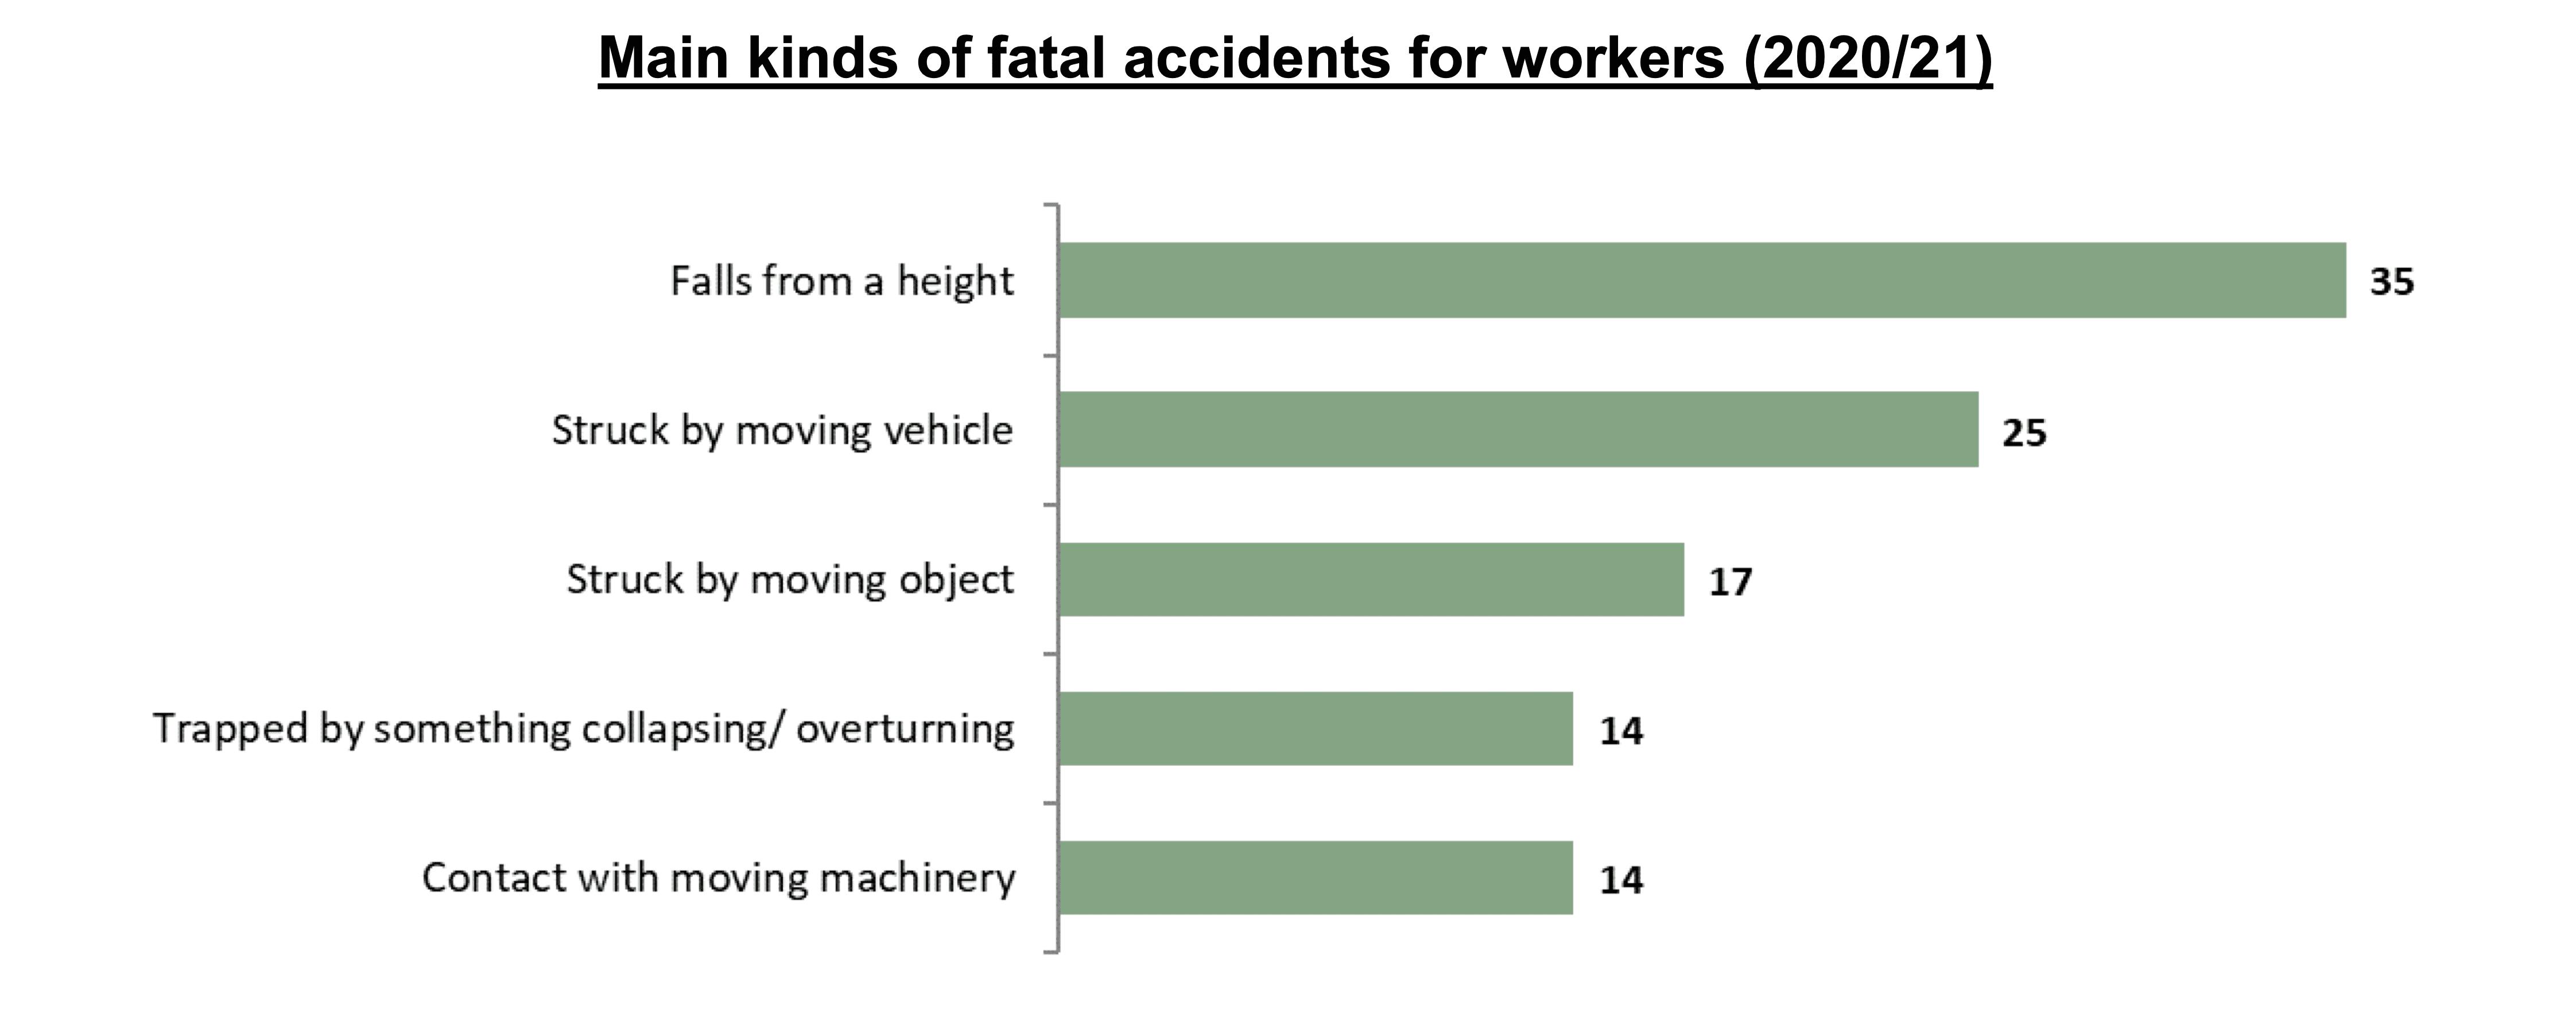 burn injury claims statistics grraph